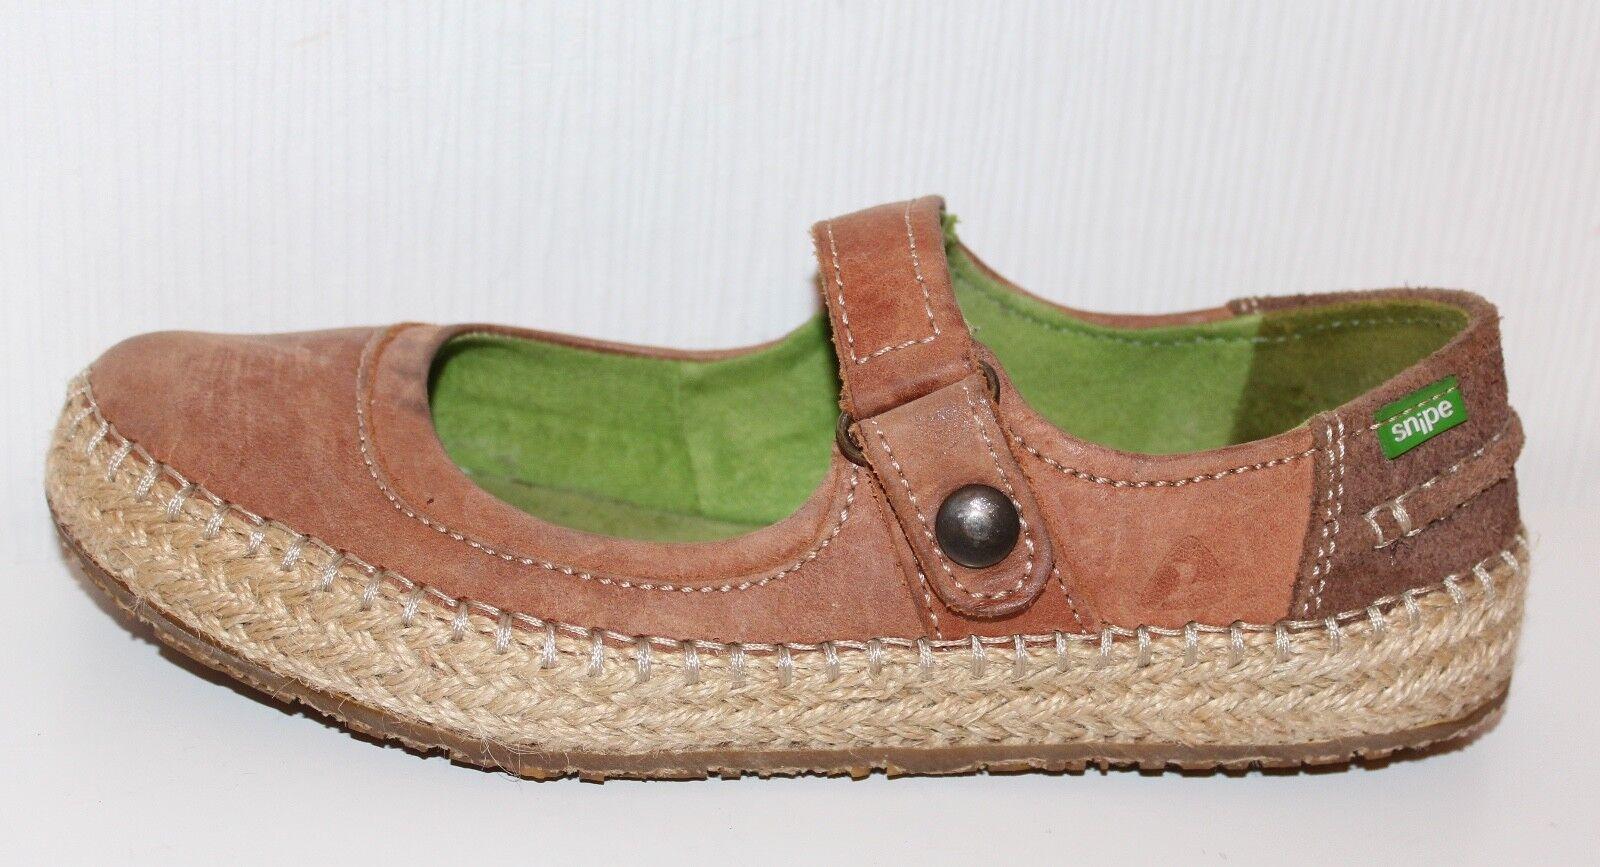 SNIPE Damen Schuhe 36 LEDER SLIPPER Lagenlook Mary Janes Ballerinas WASCHBÄR Lagenlook SLIPPER f445a6